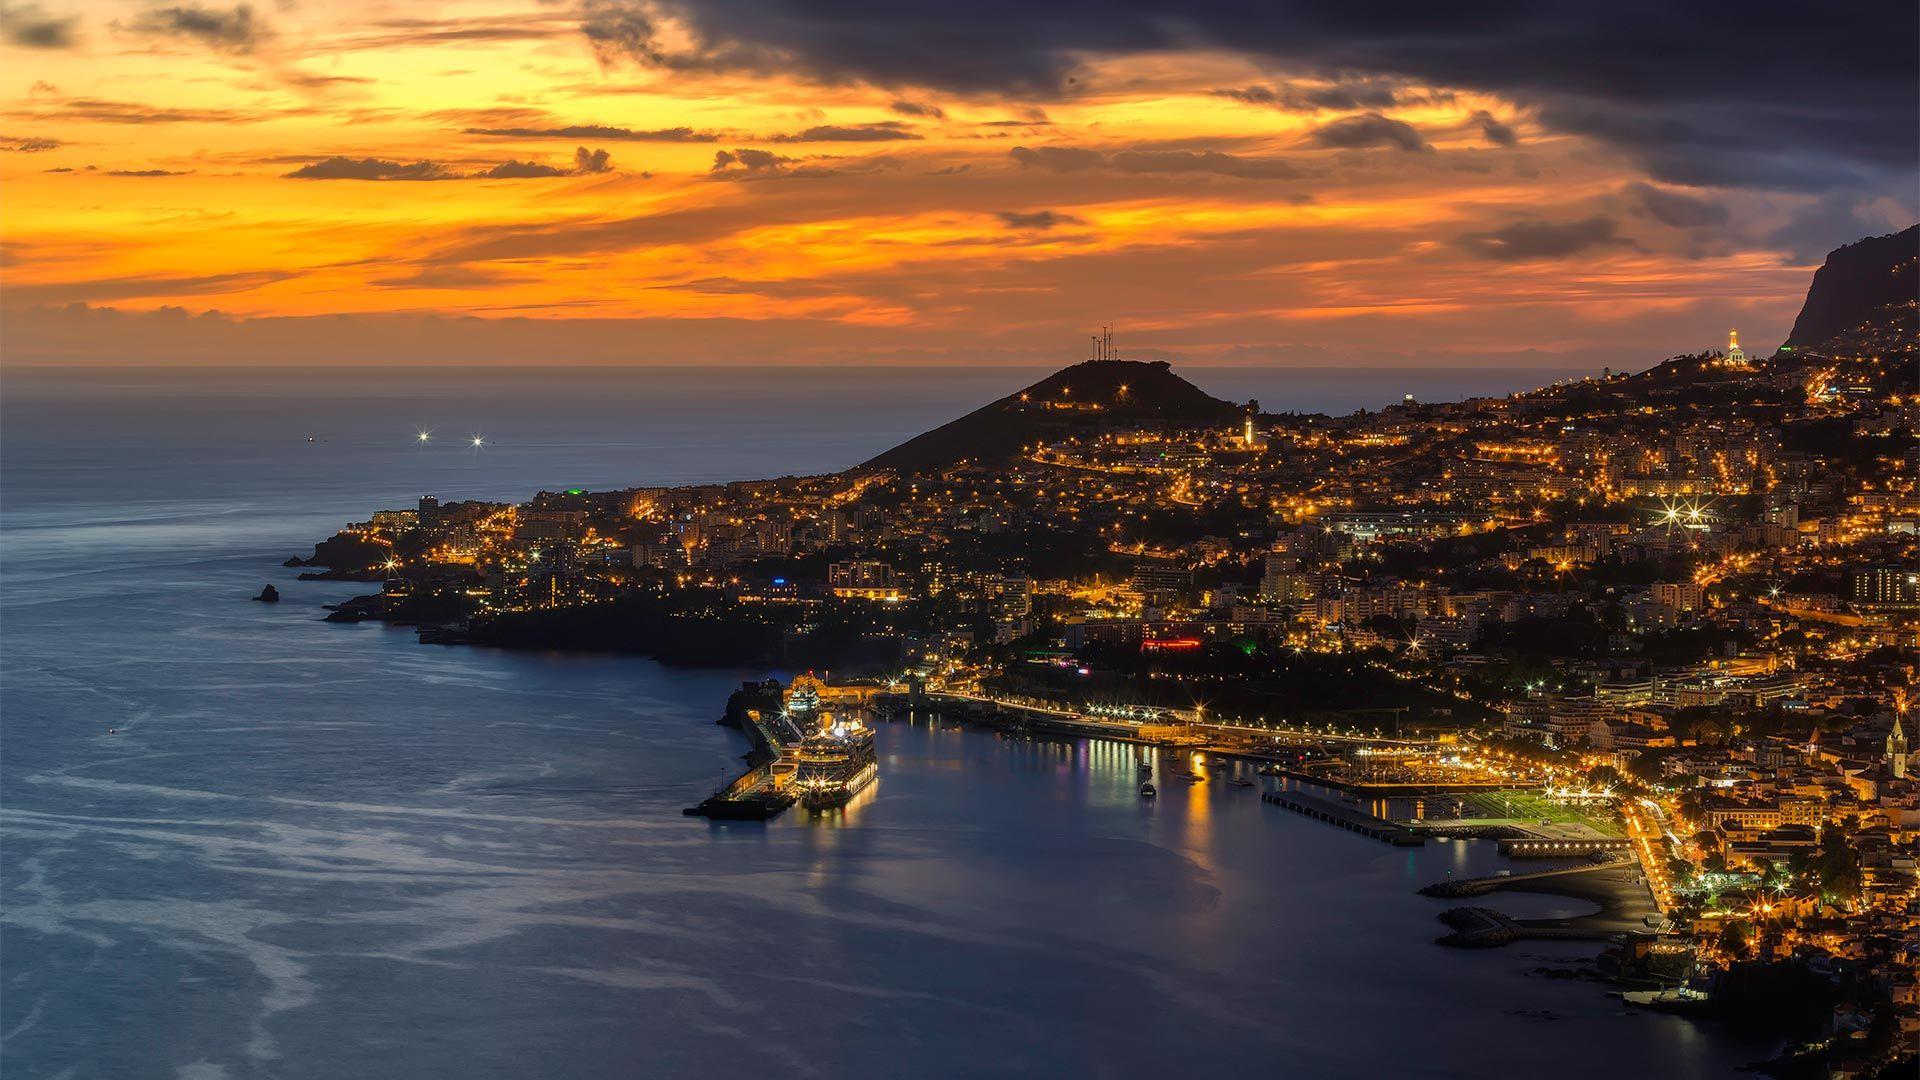 Sejur plaja Savoy Signature Madeira, 8 zile - 28 august 2021